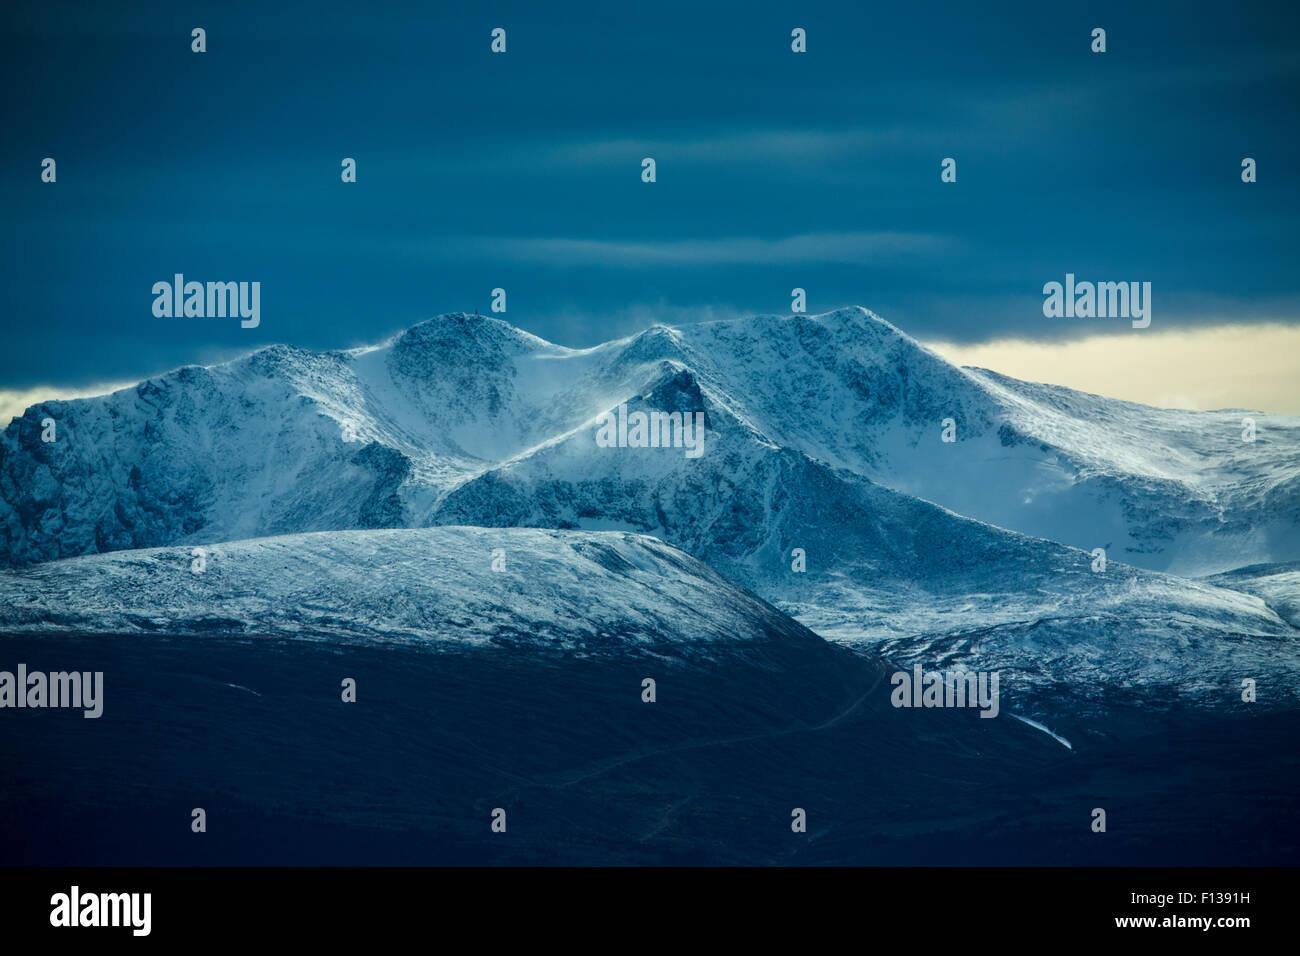 Montana Mountain, near Carcross, Yukon Territories, Canada, September 2013. - Stock Image